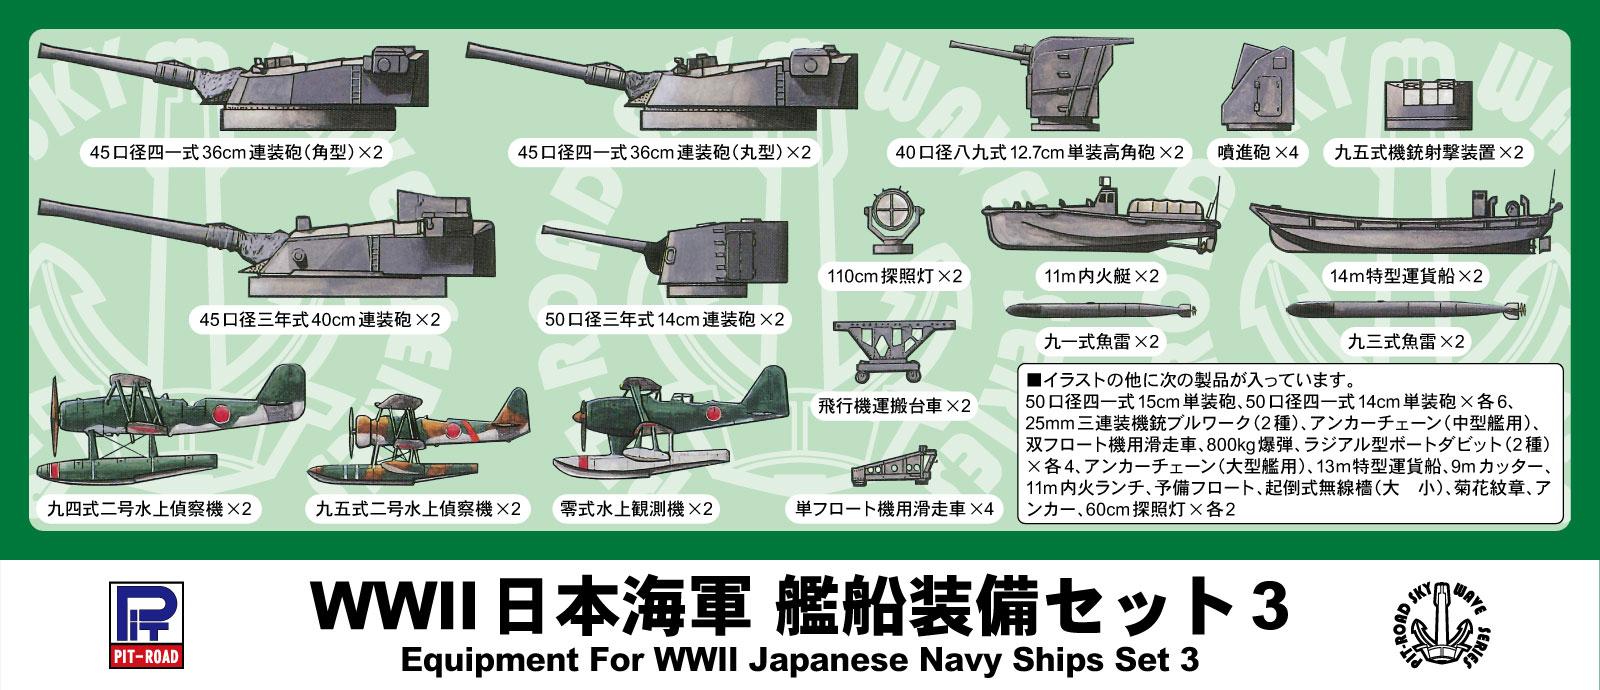 E03 1/700 日本海軍 艦船装備セット 3